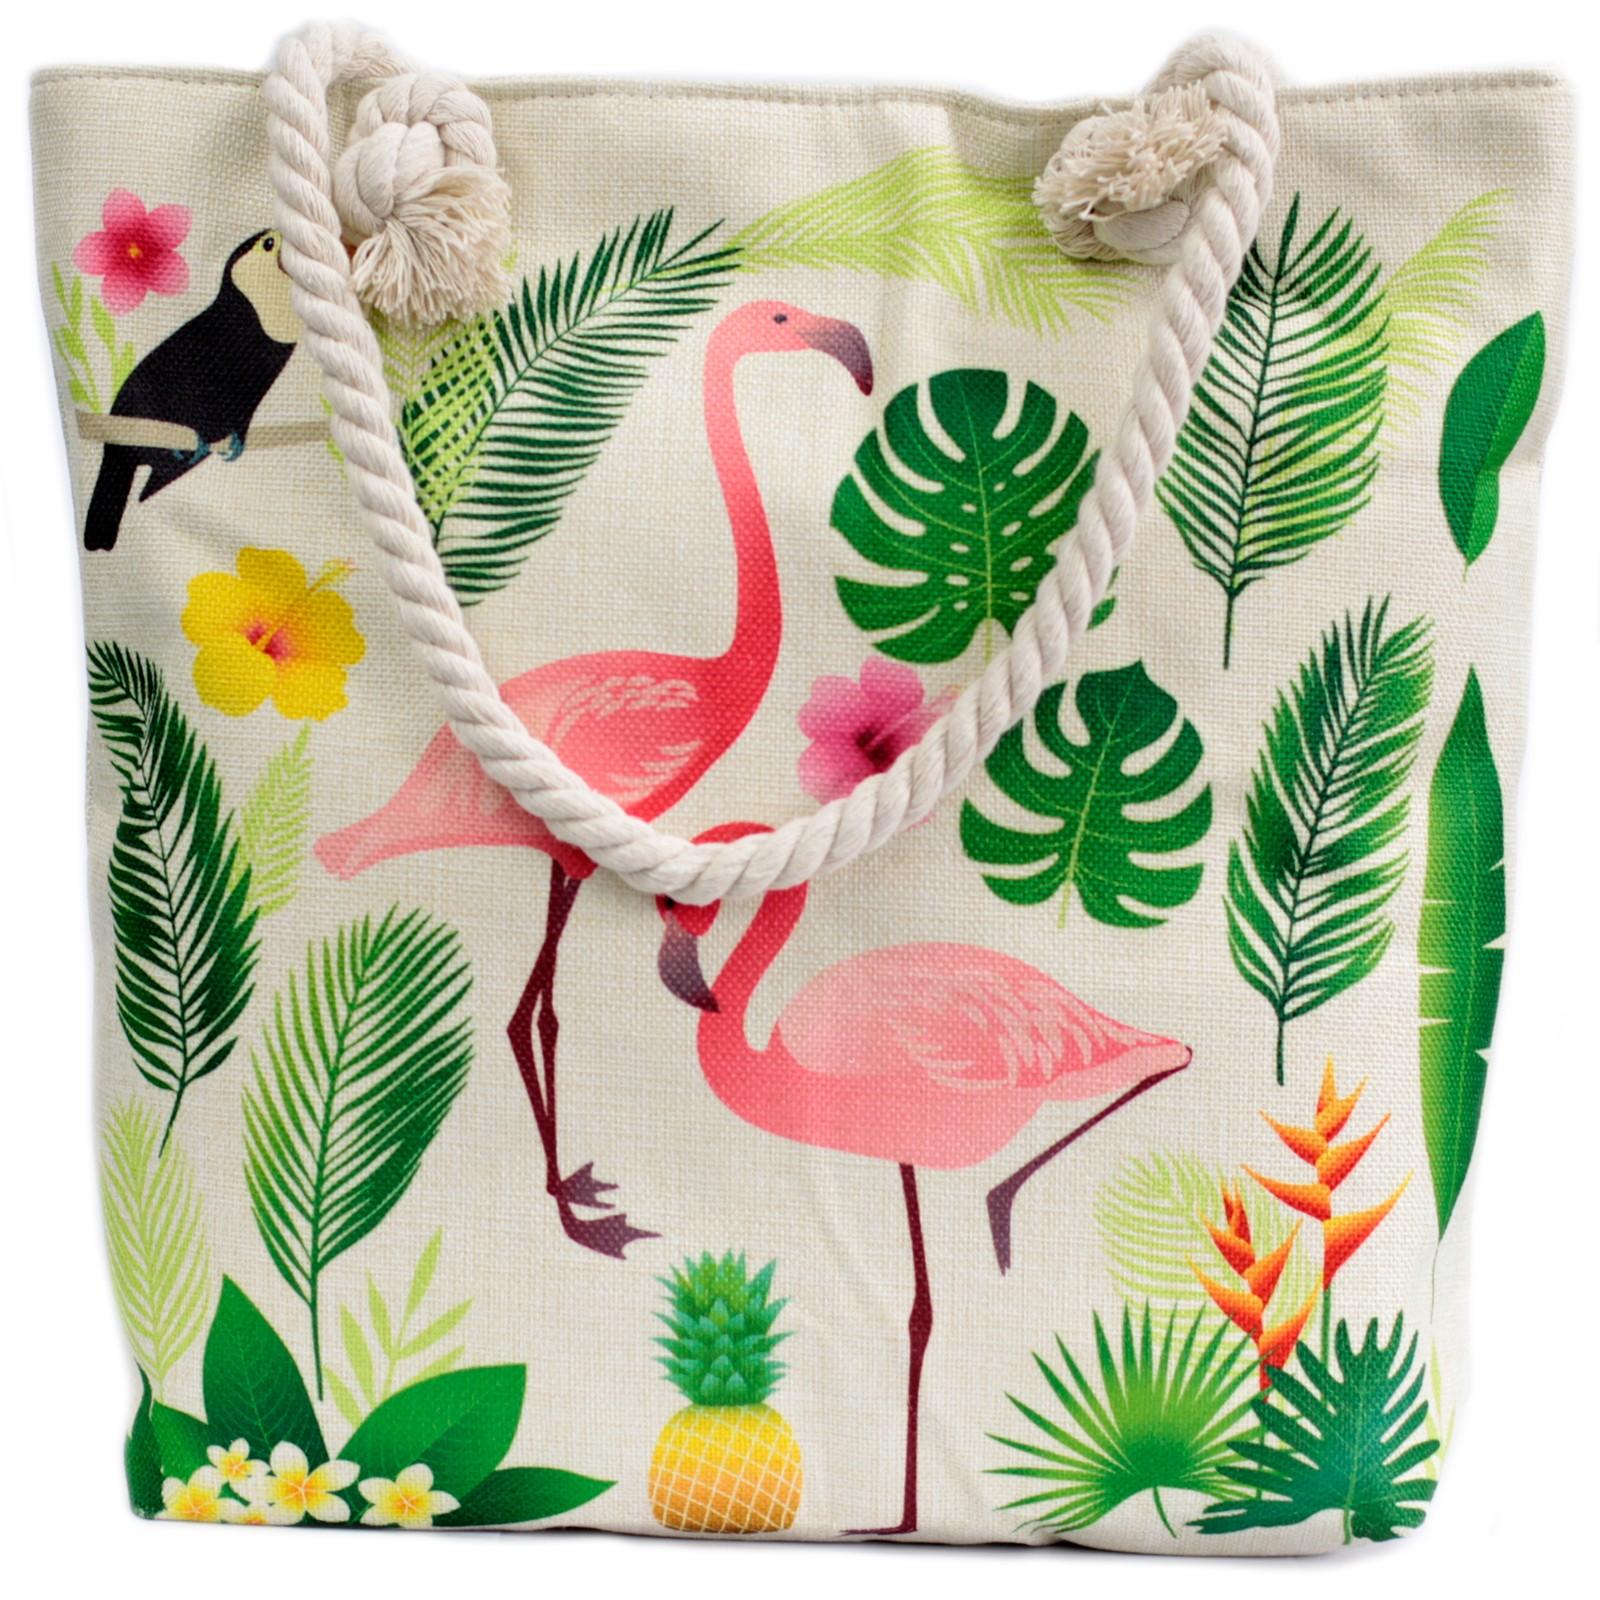 Rope Handle Bag Flamingo and More